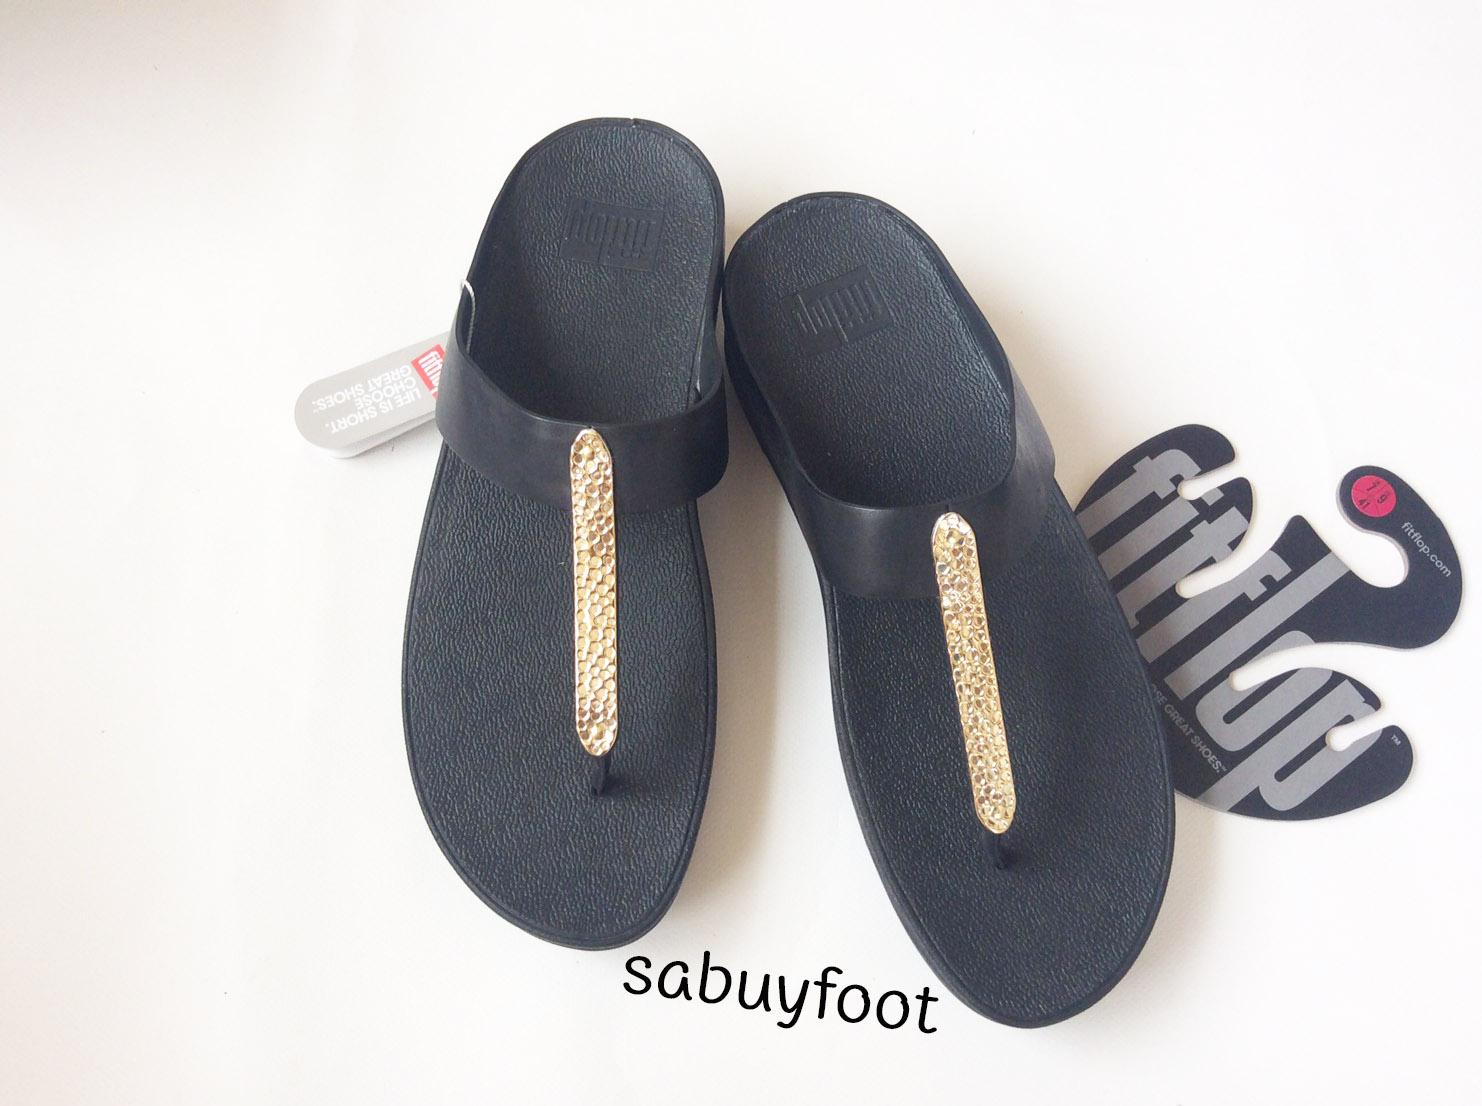 06d4c42634202 พรีออเดอร์   Fitflop Barrio Black - Sabuyfoot   Inspired by LnwShop.com